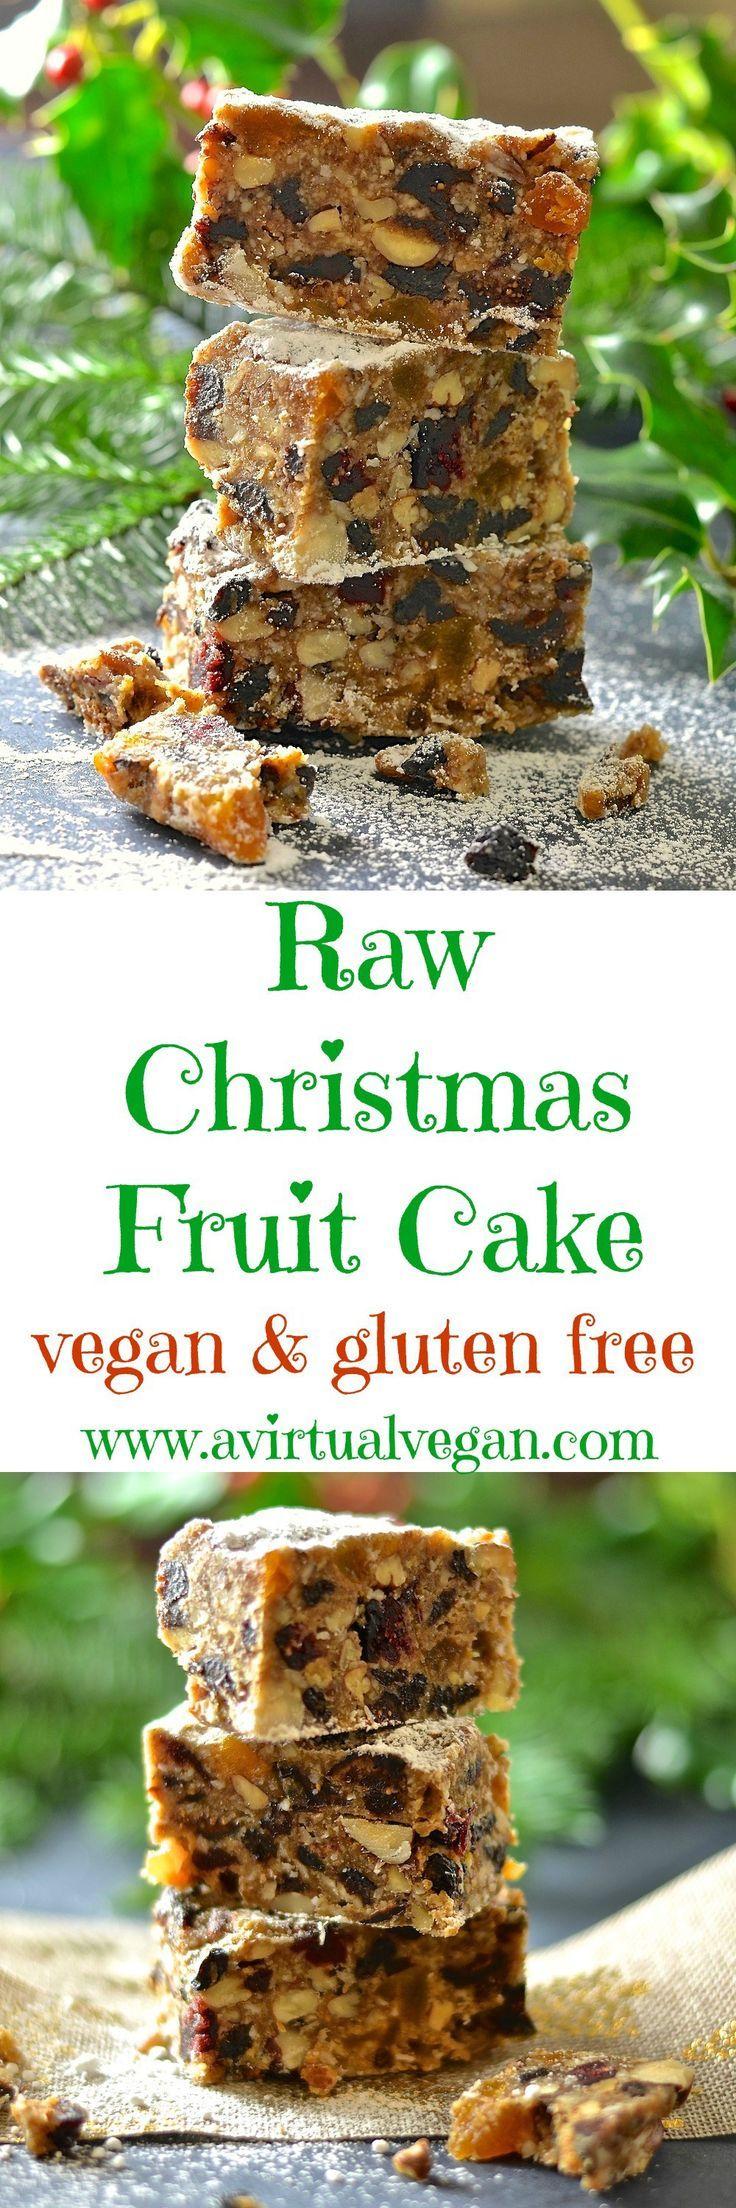 Raw Christmas Fruit Cake Recipe Vegan fruit cake